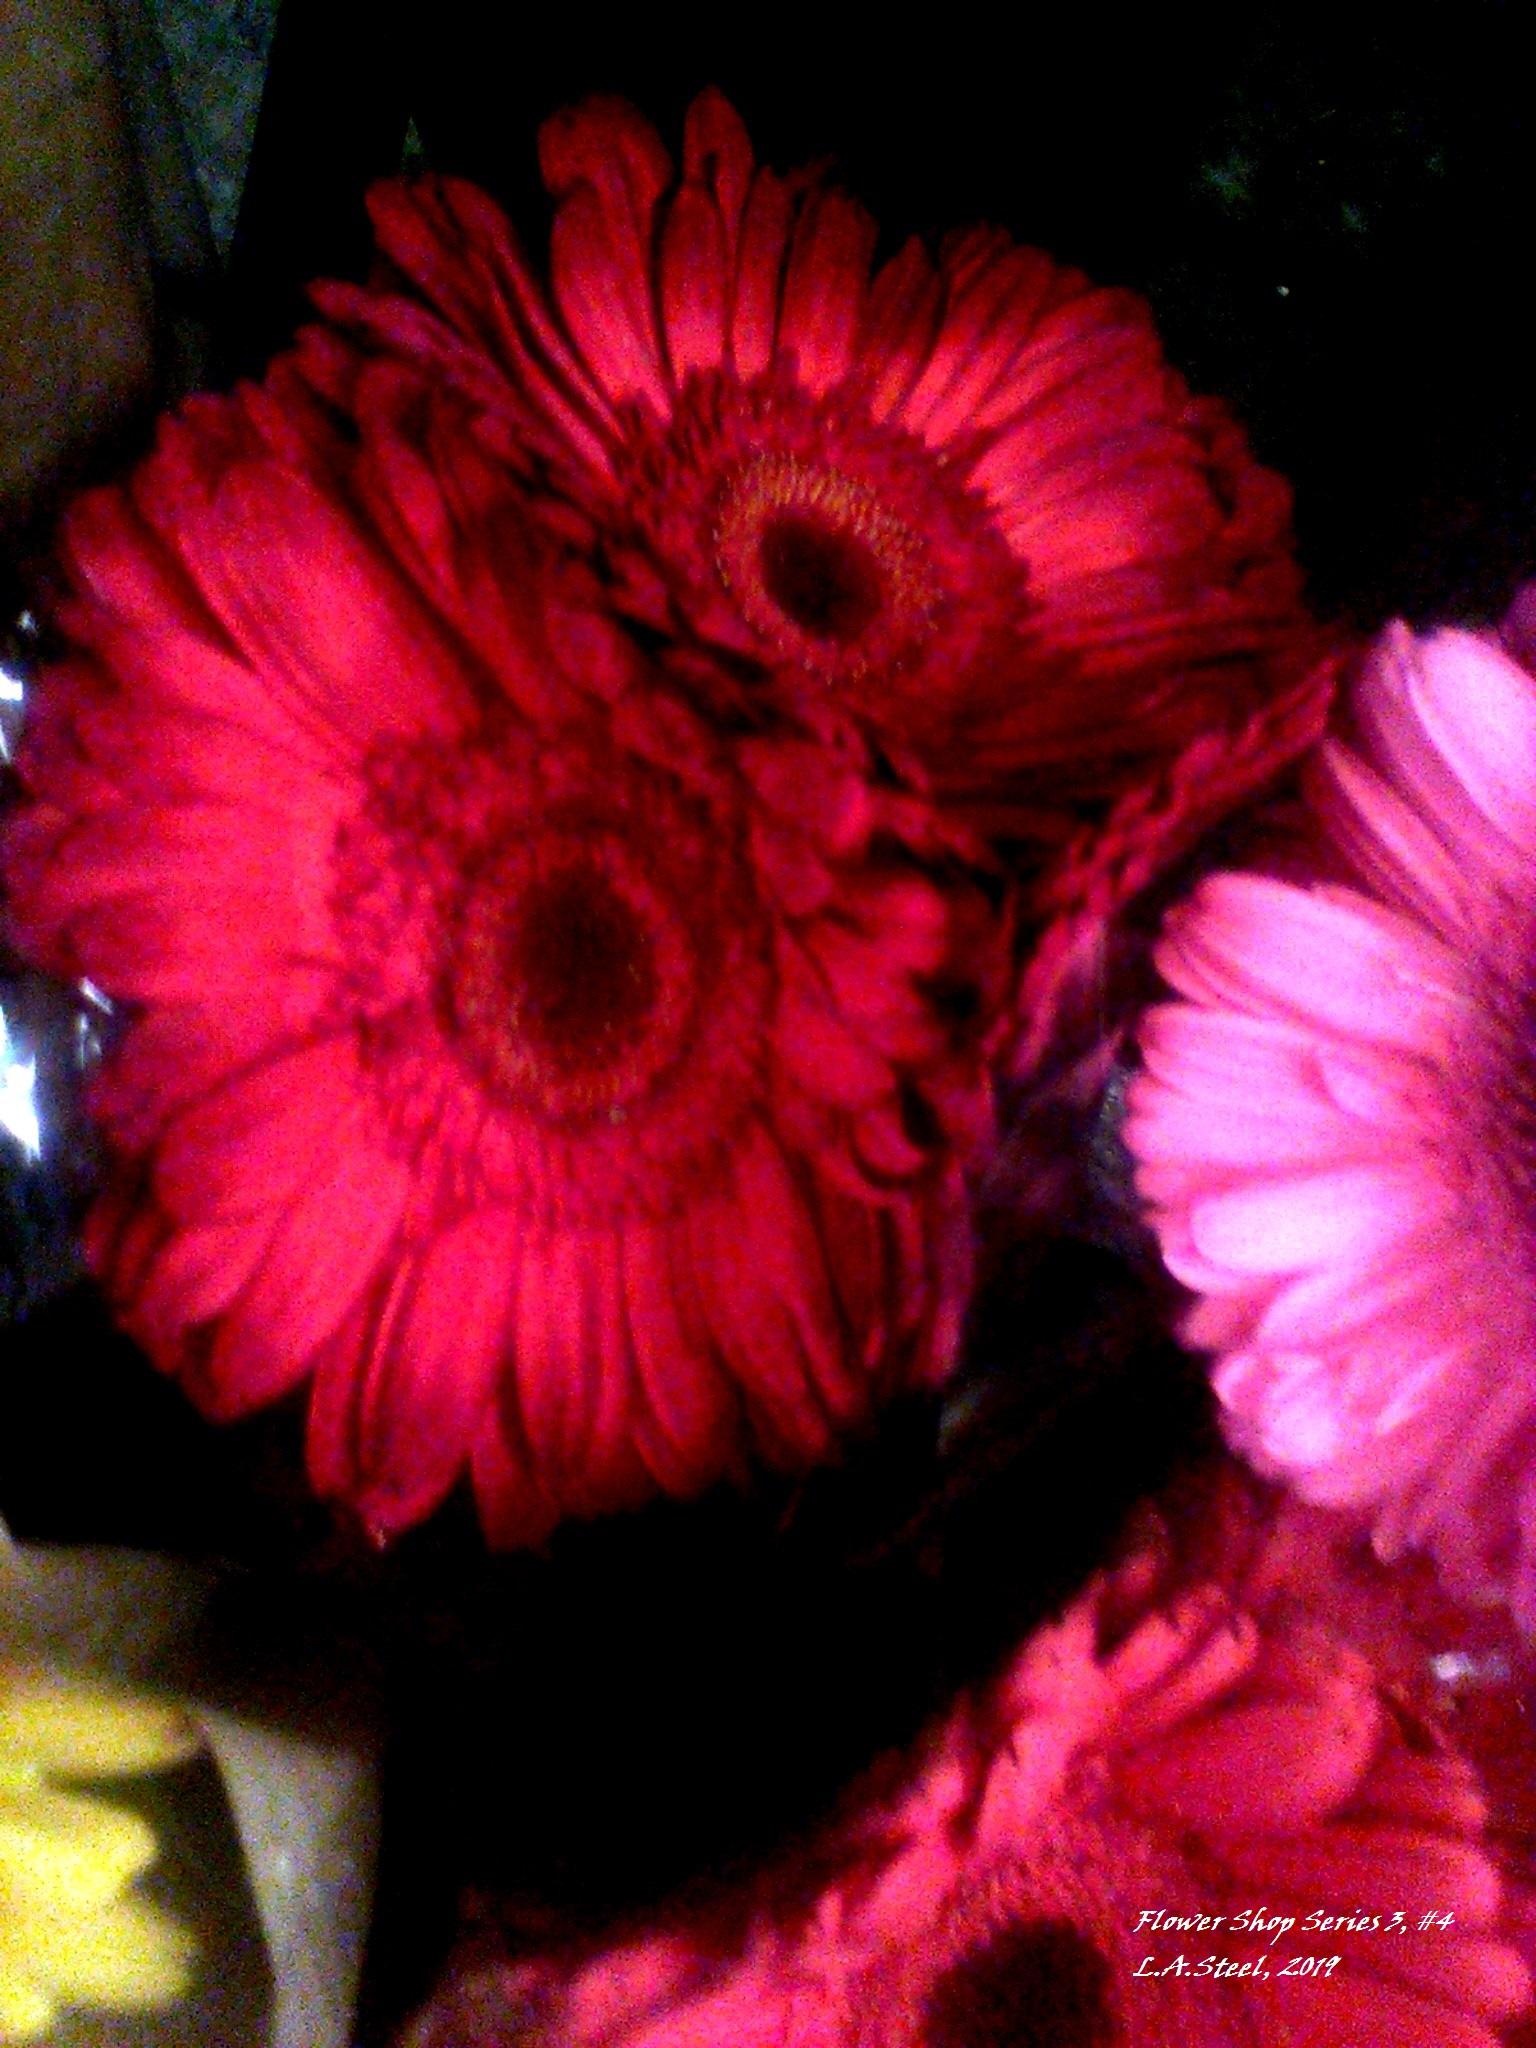 flower shop series 3 4 2019